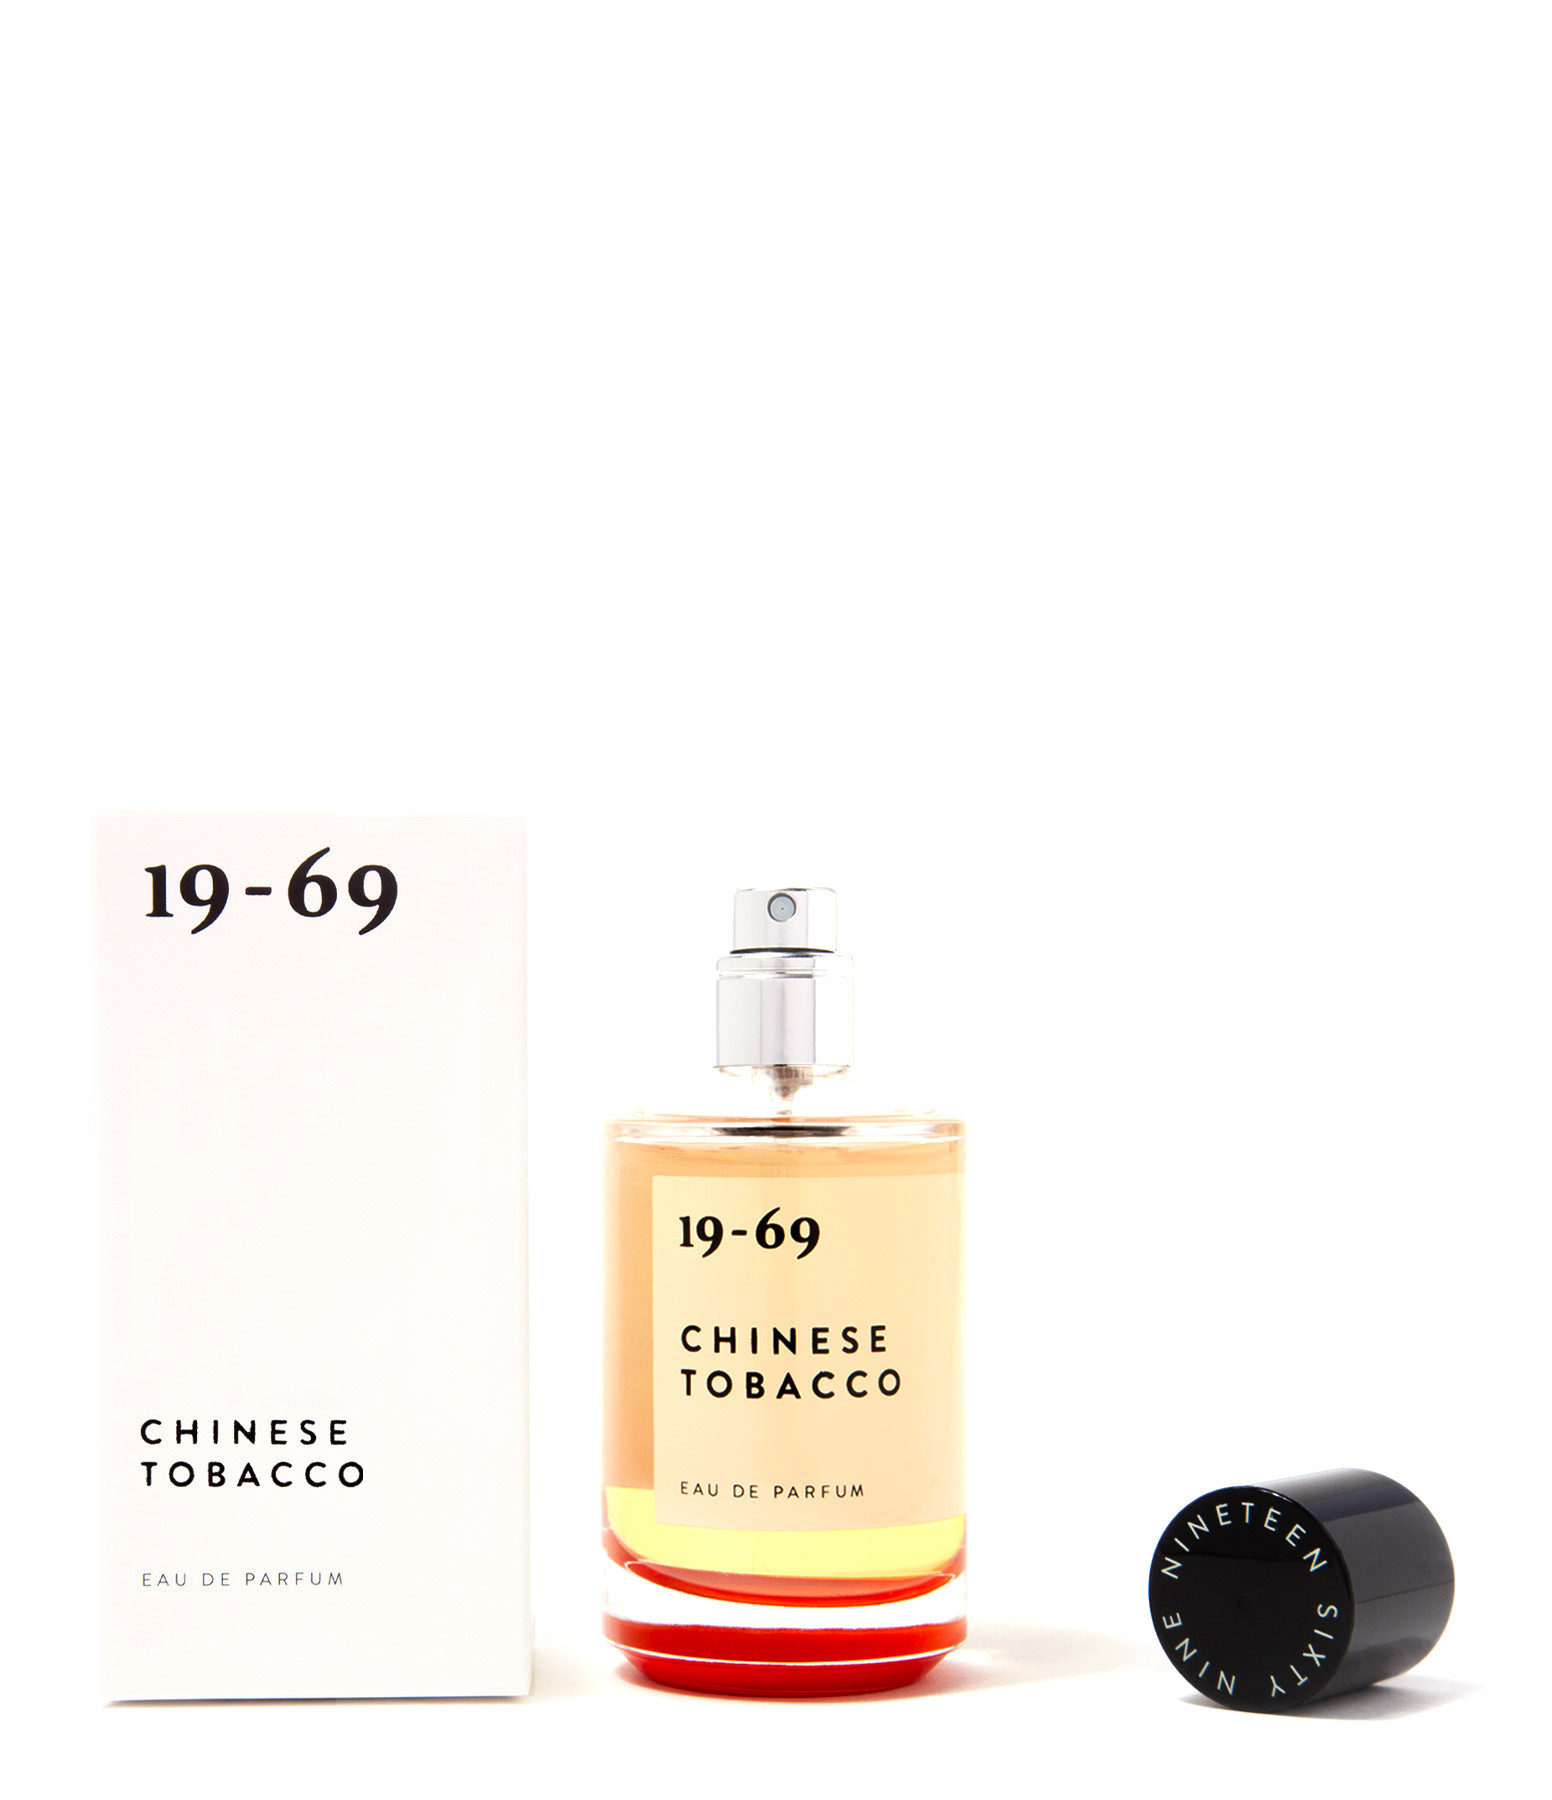 19-69 - Eau de Parfum Chinese Tobacco 100 ml